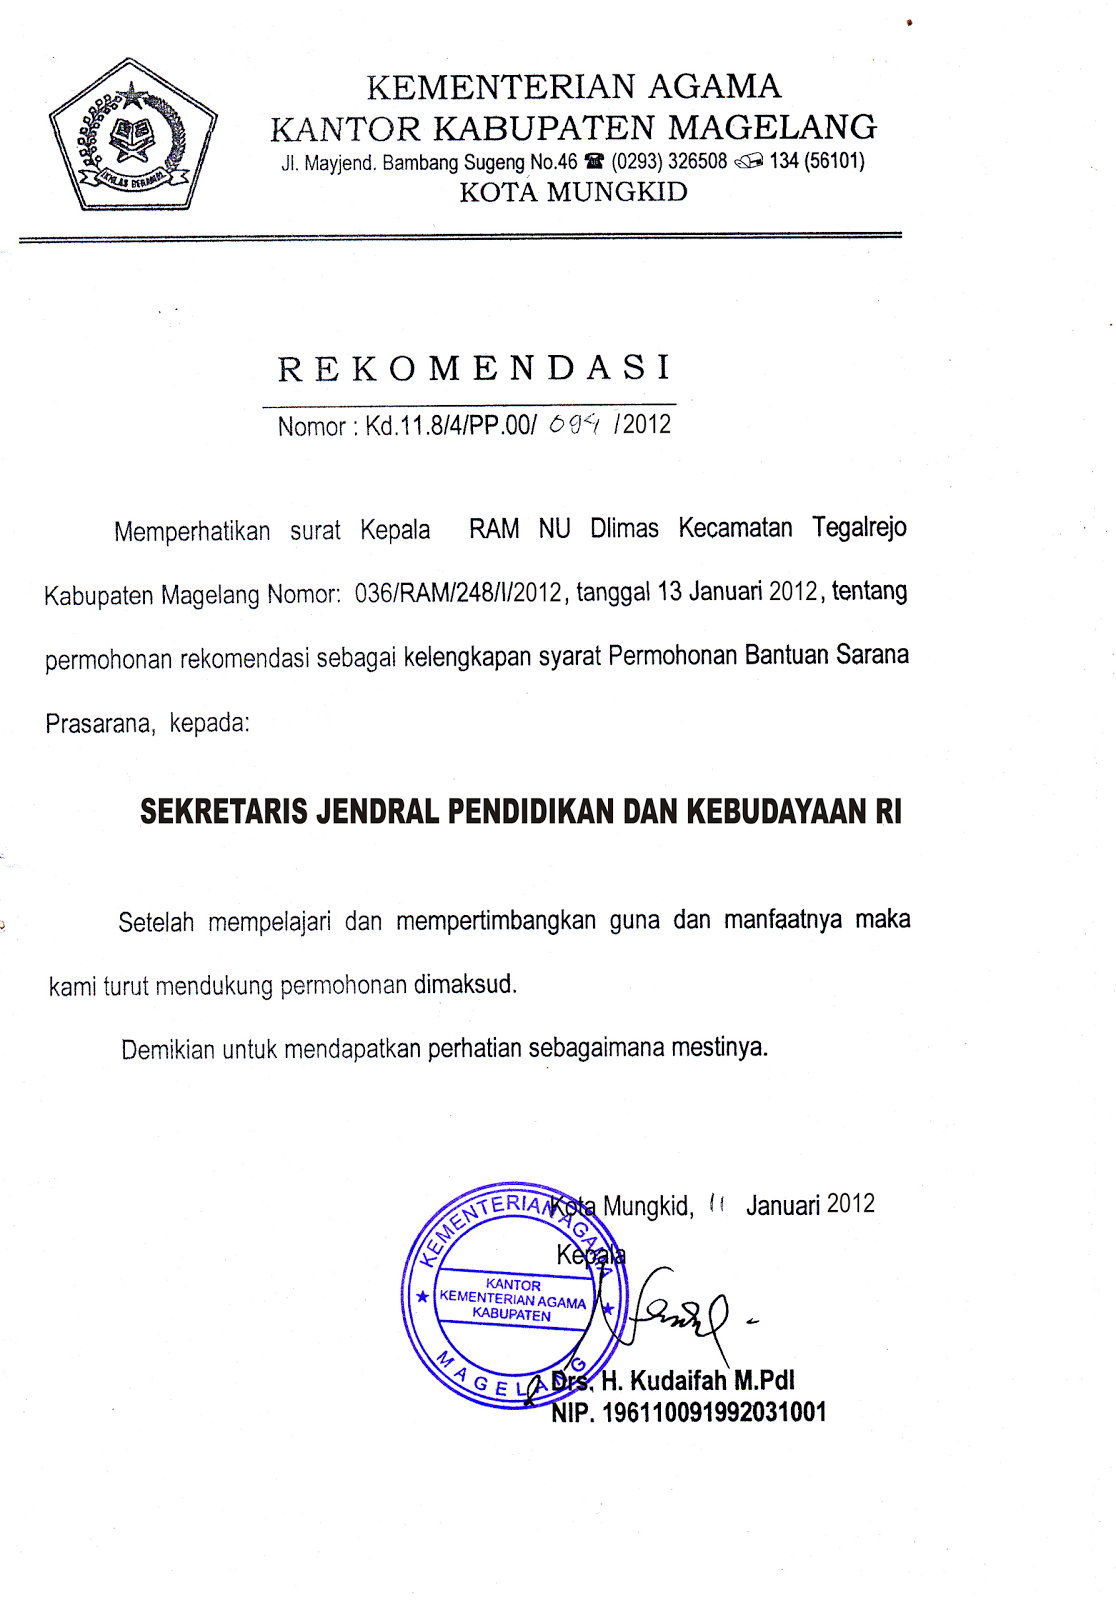 Contoh Surat Rekomendasi Kepada Sekjen Pendidikan Uchavision